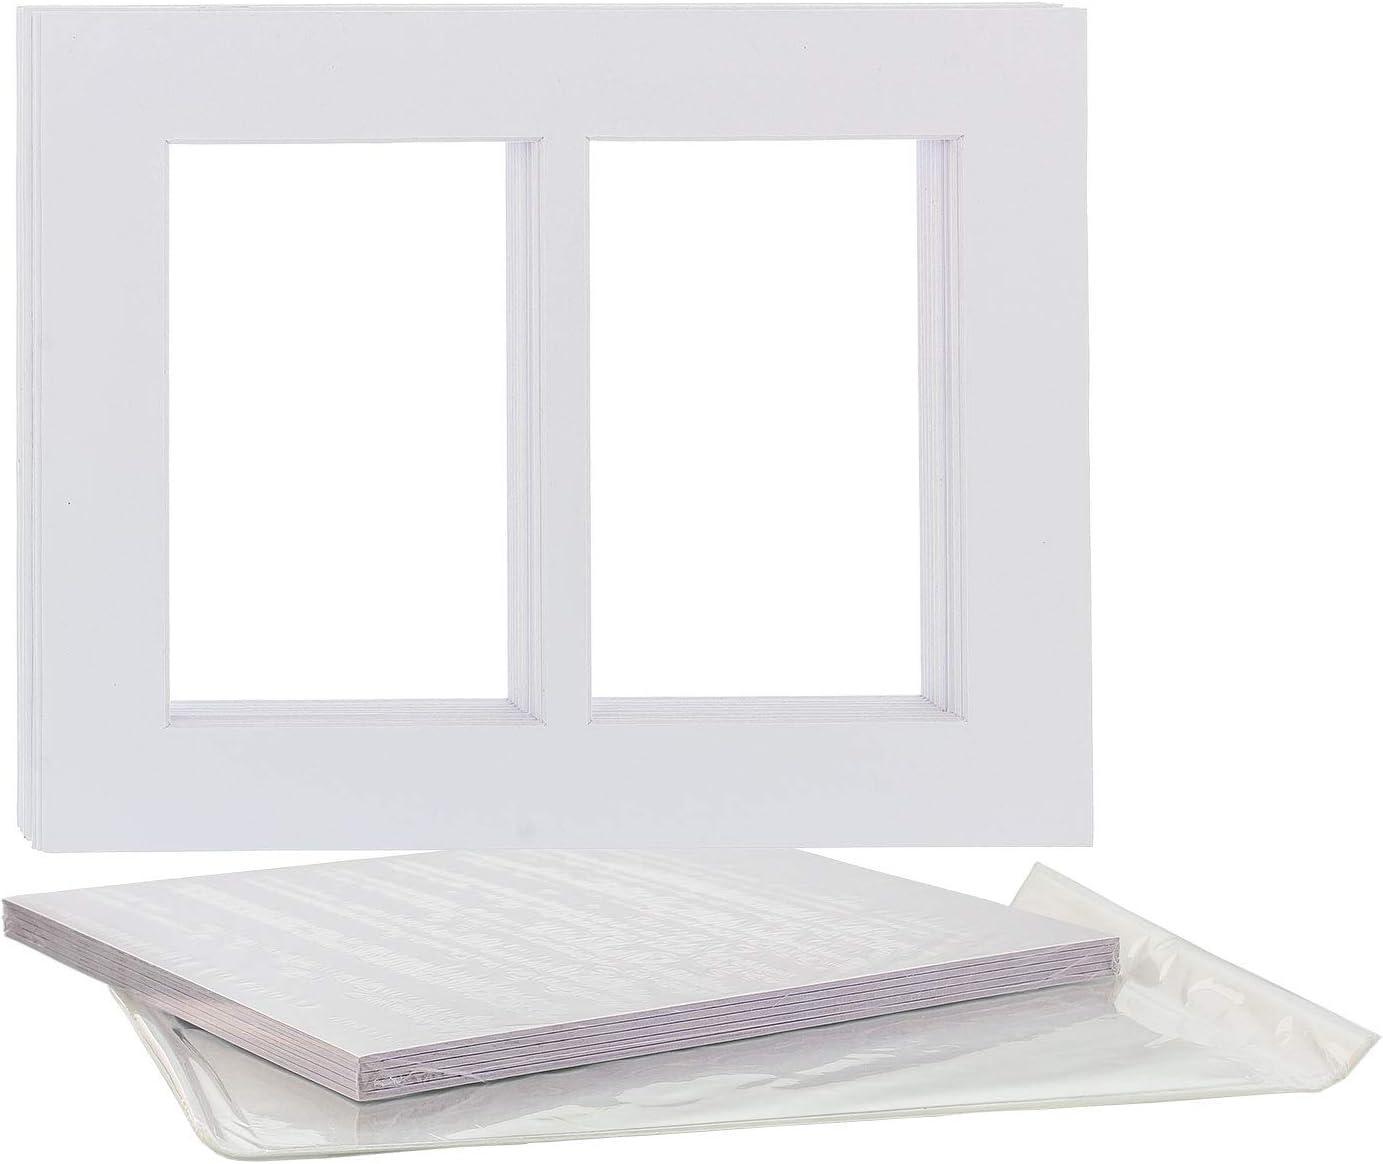 Backboard /& Clear Bags Mats U.S Art Supply 8X10 Black Multi-Window Photo Mat Board Set 10 Sets